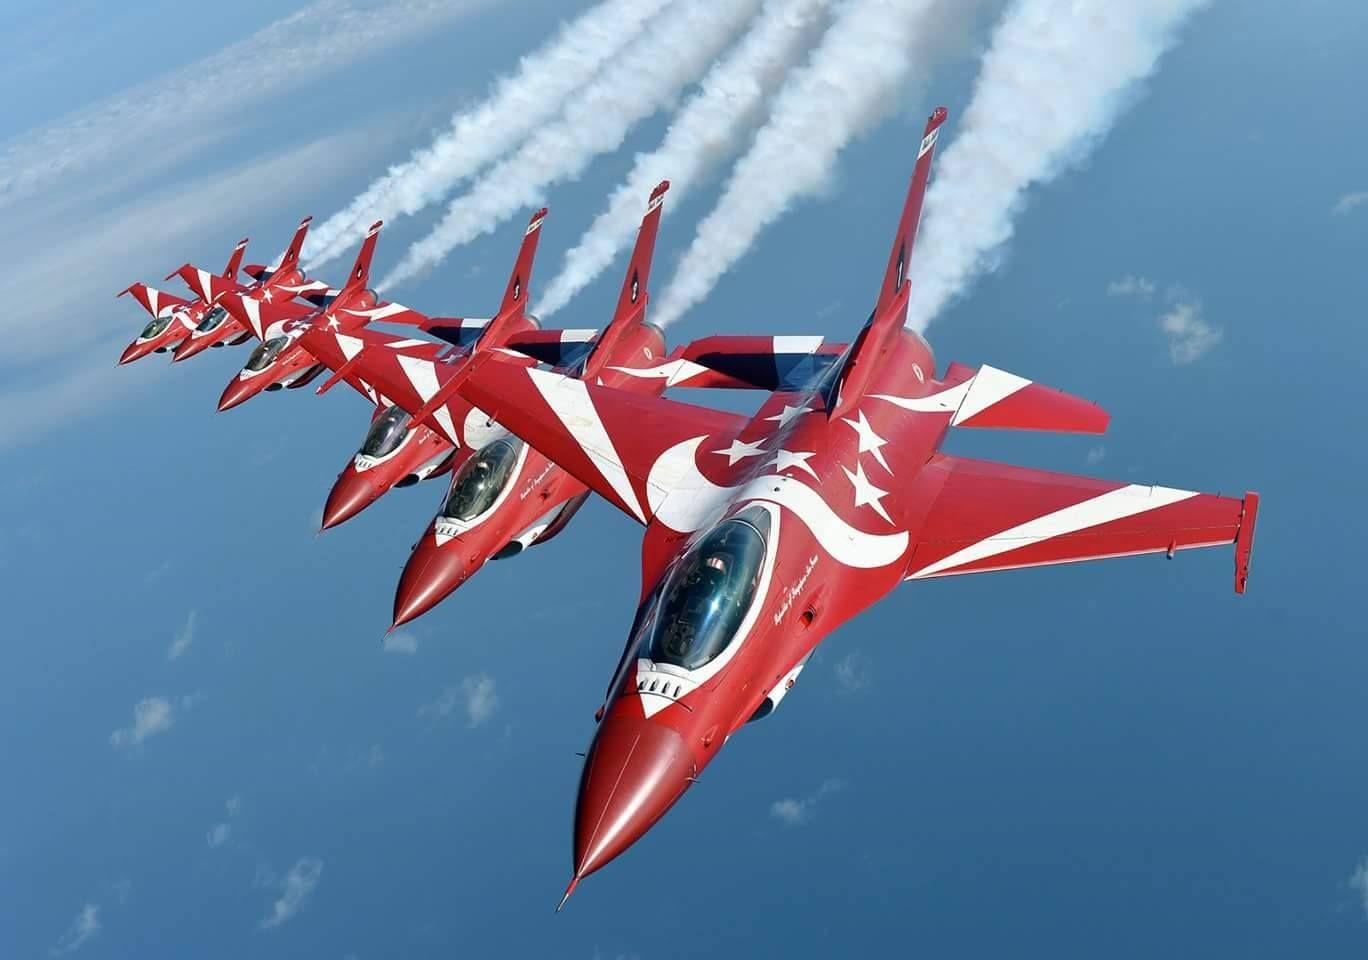 Republic Of Singapore Air Force Black Knights Lockheed Martin F 16c Block 52 Fighting Falcons Air Force Wallpaper Air Fighter Fighter Aircraft